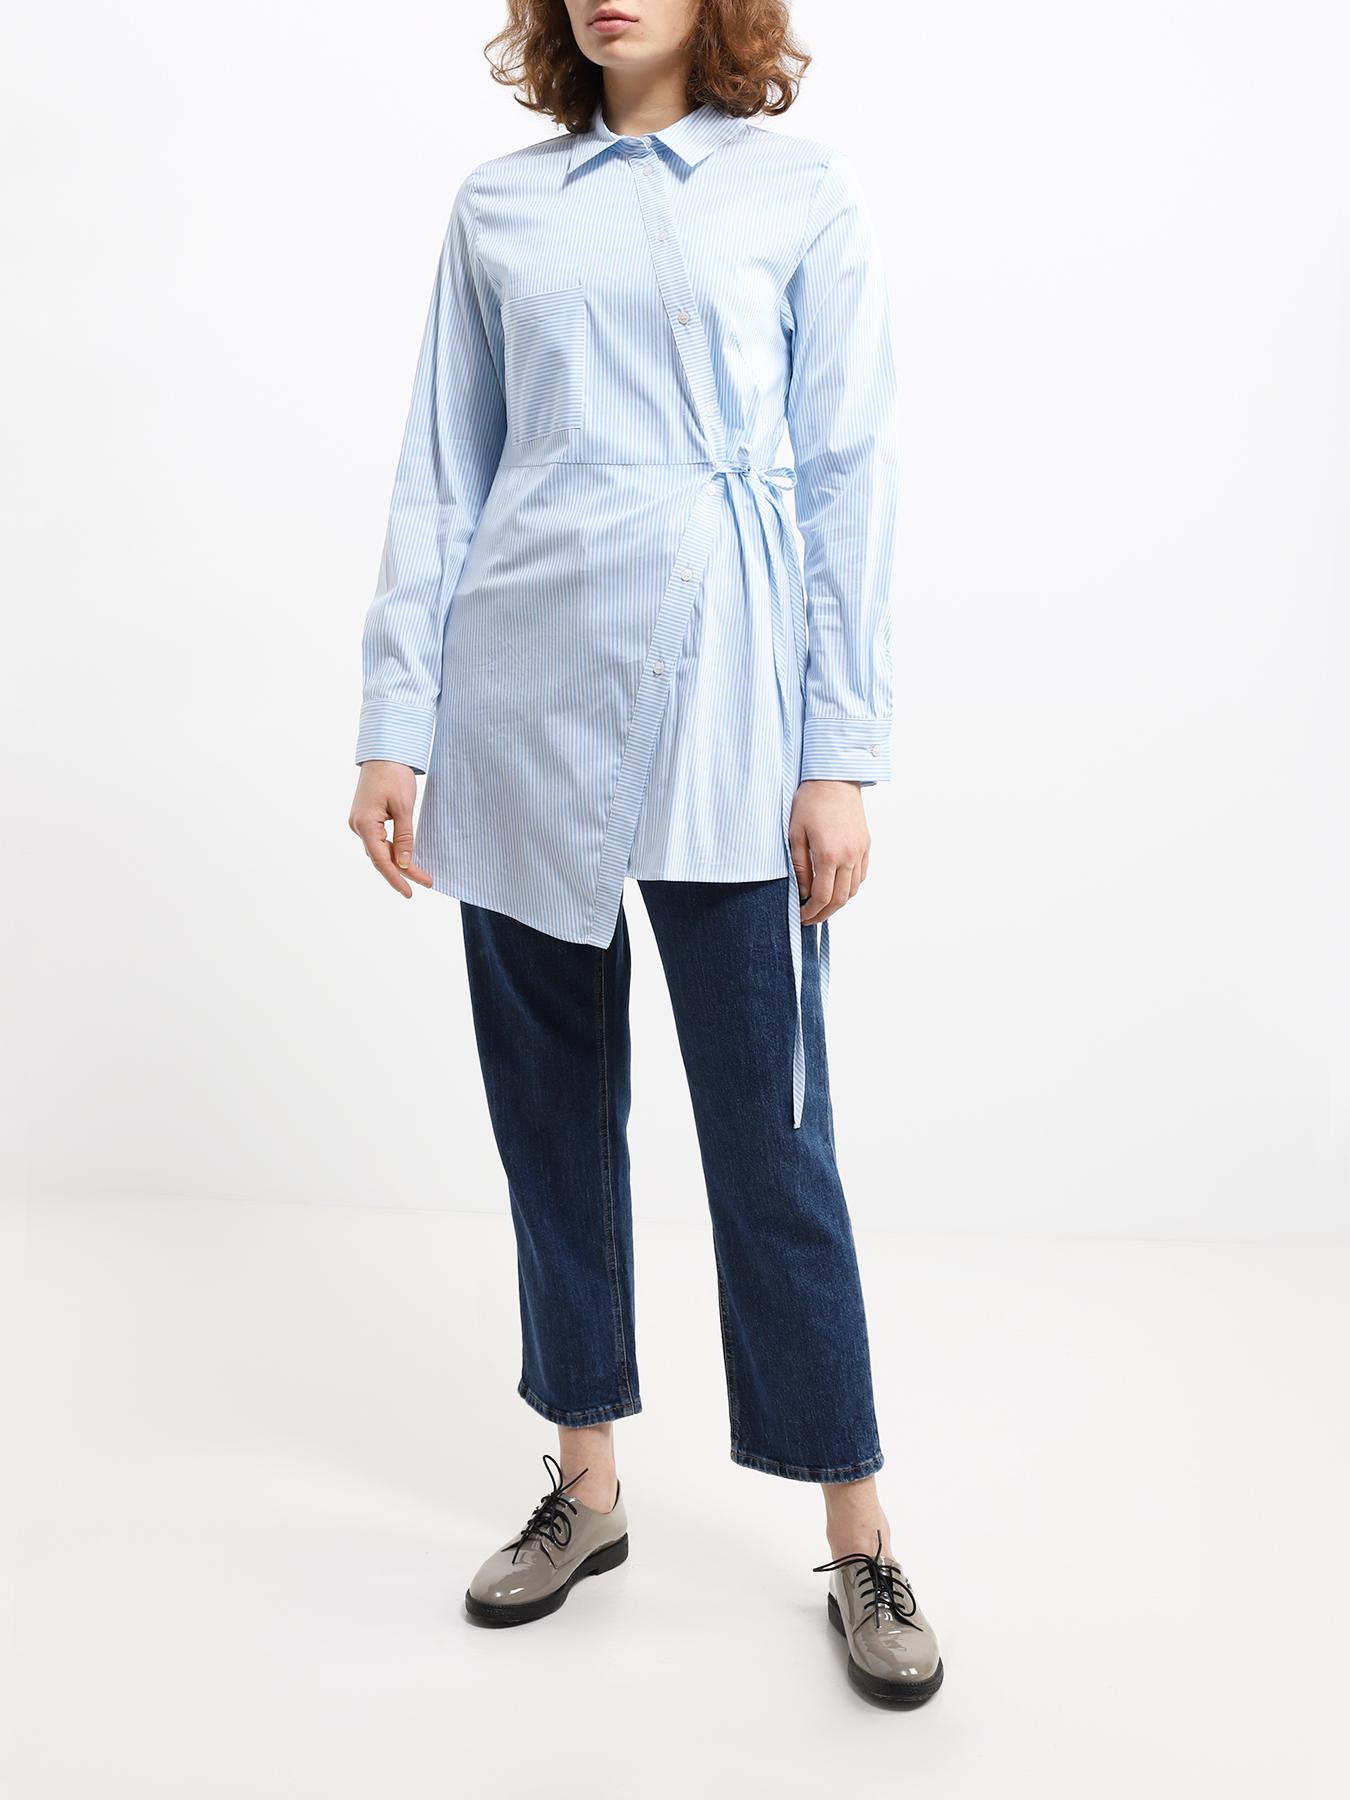 Блузка Emme Marella Рубашка с поясом на запах Slitta